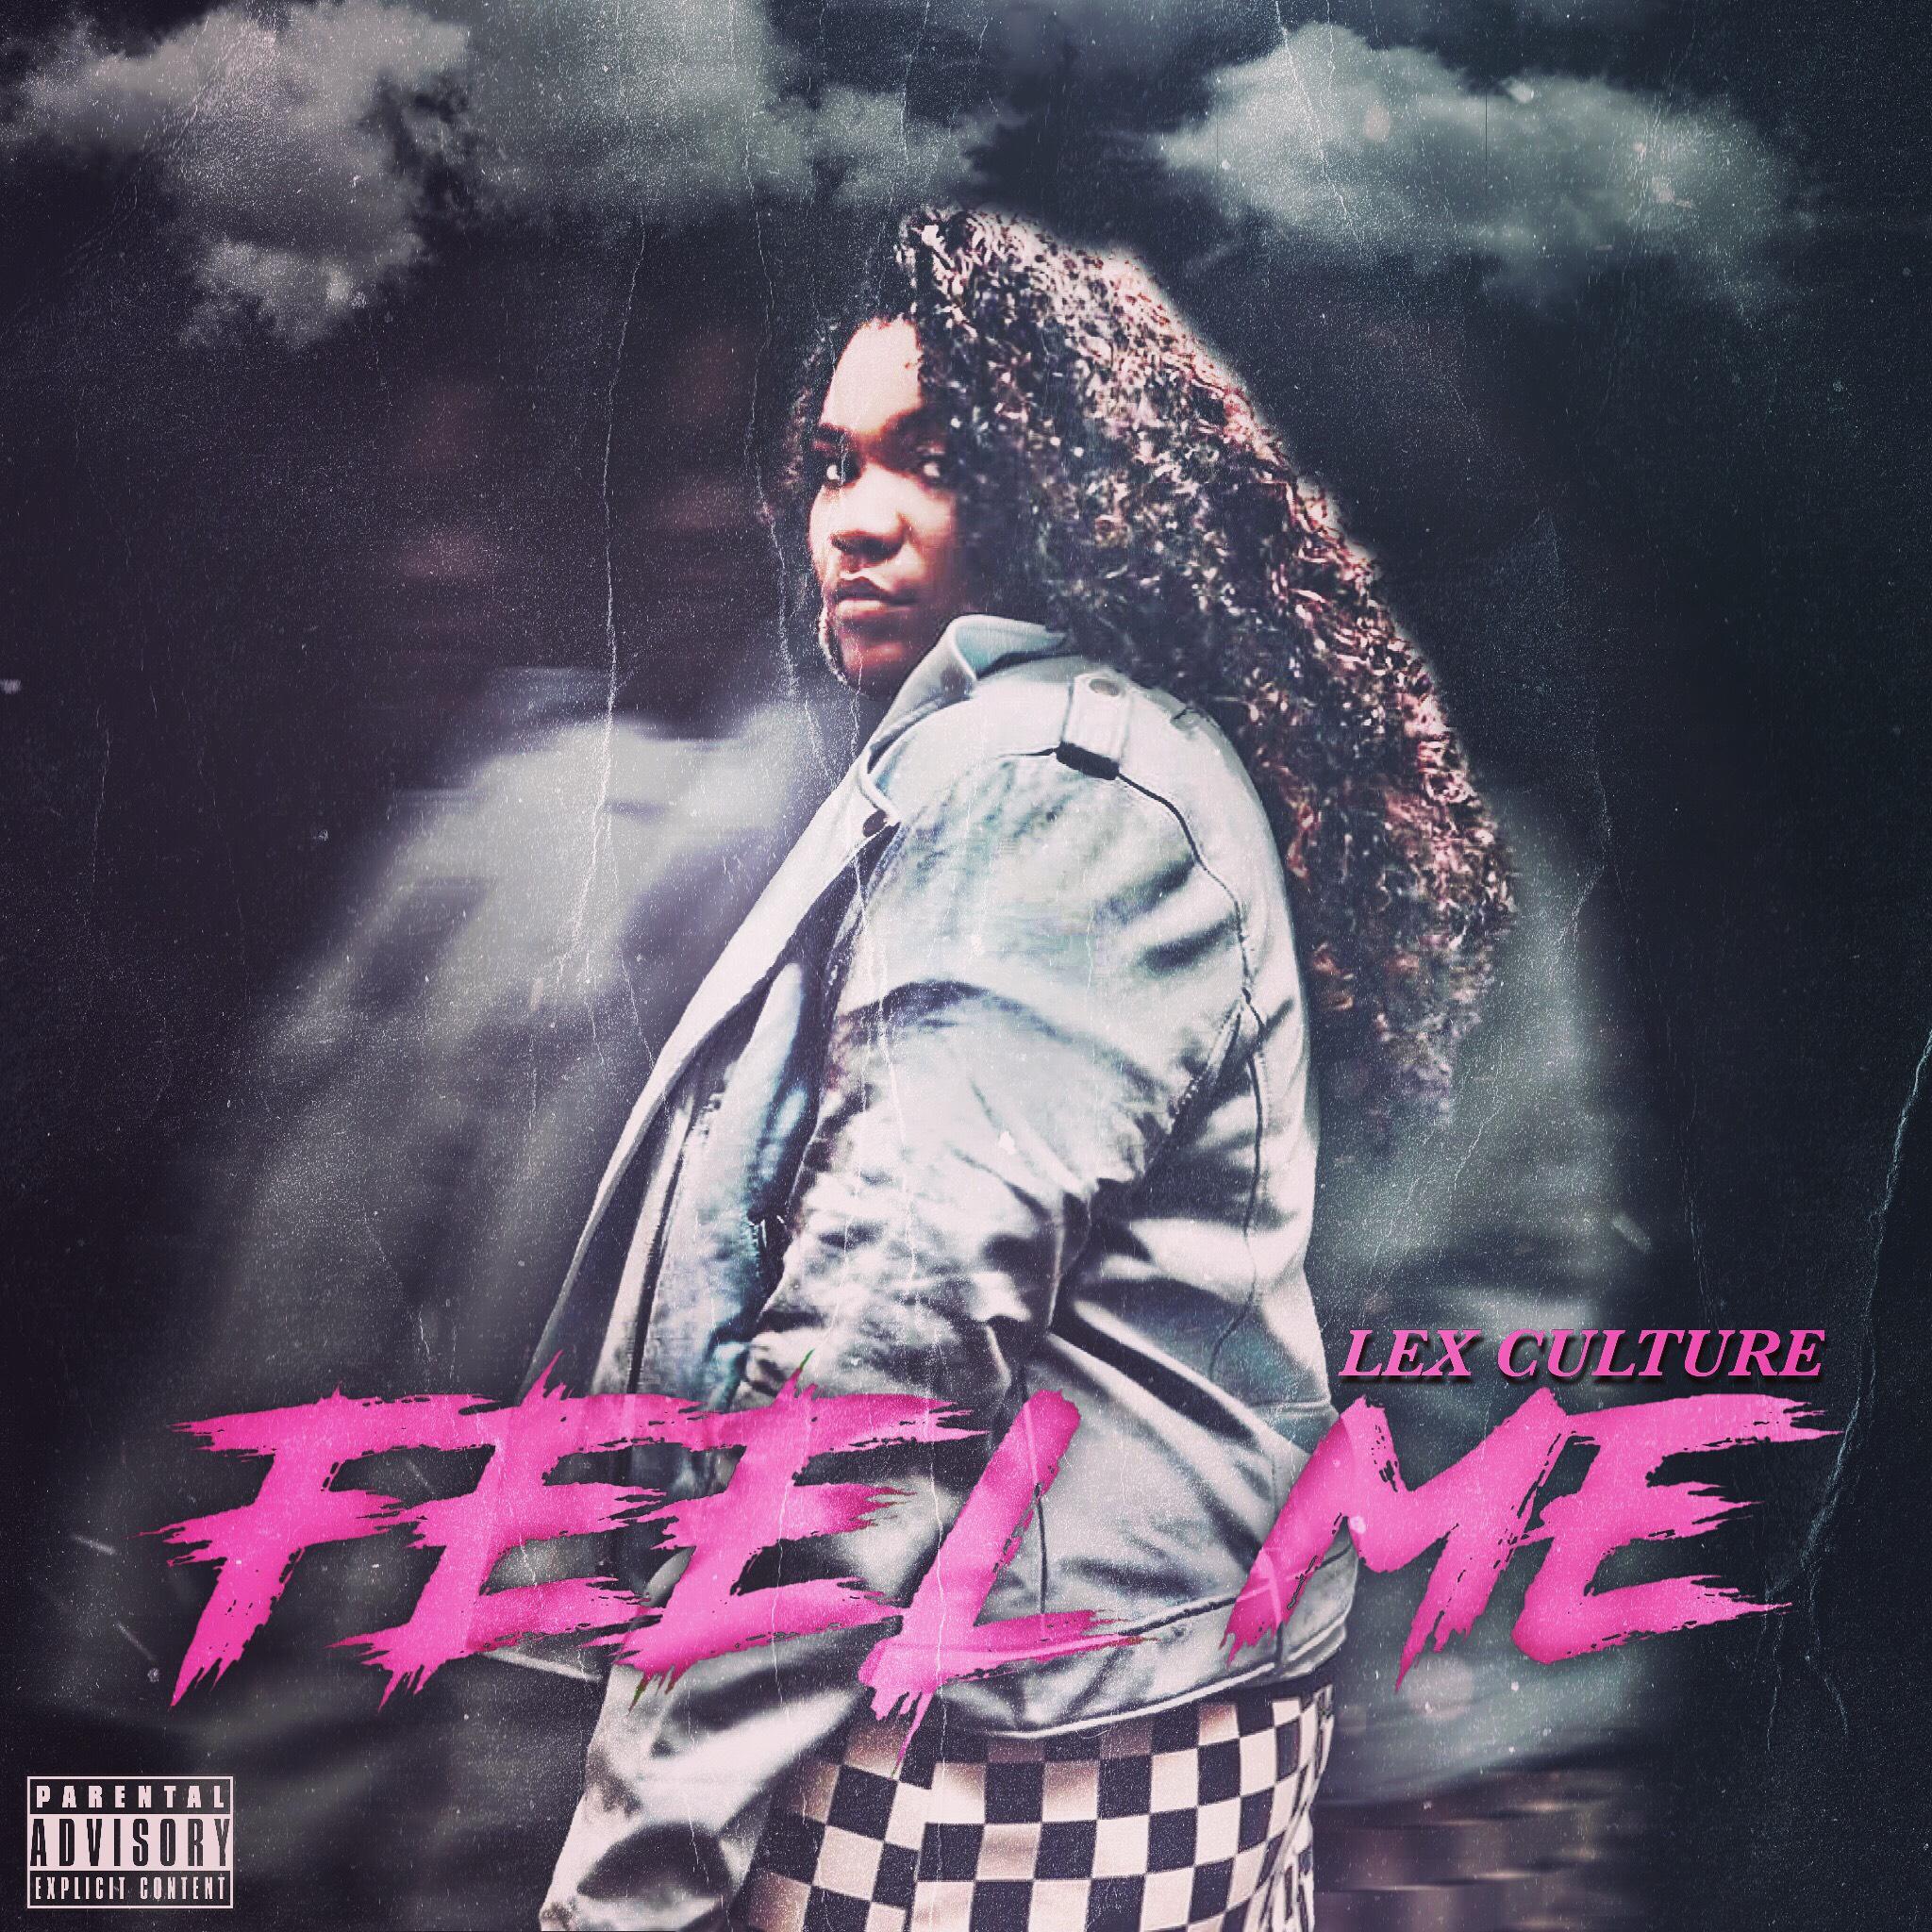 Lex Culture - Feel Me New Song